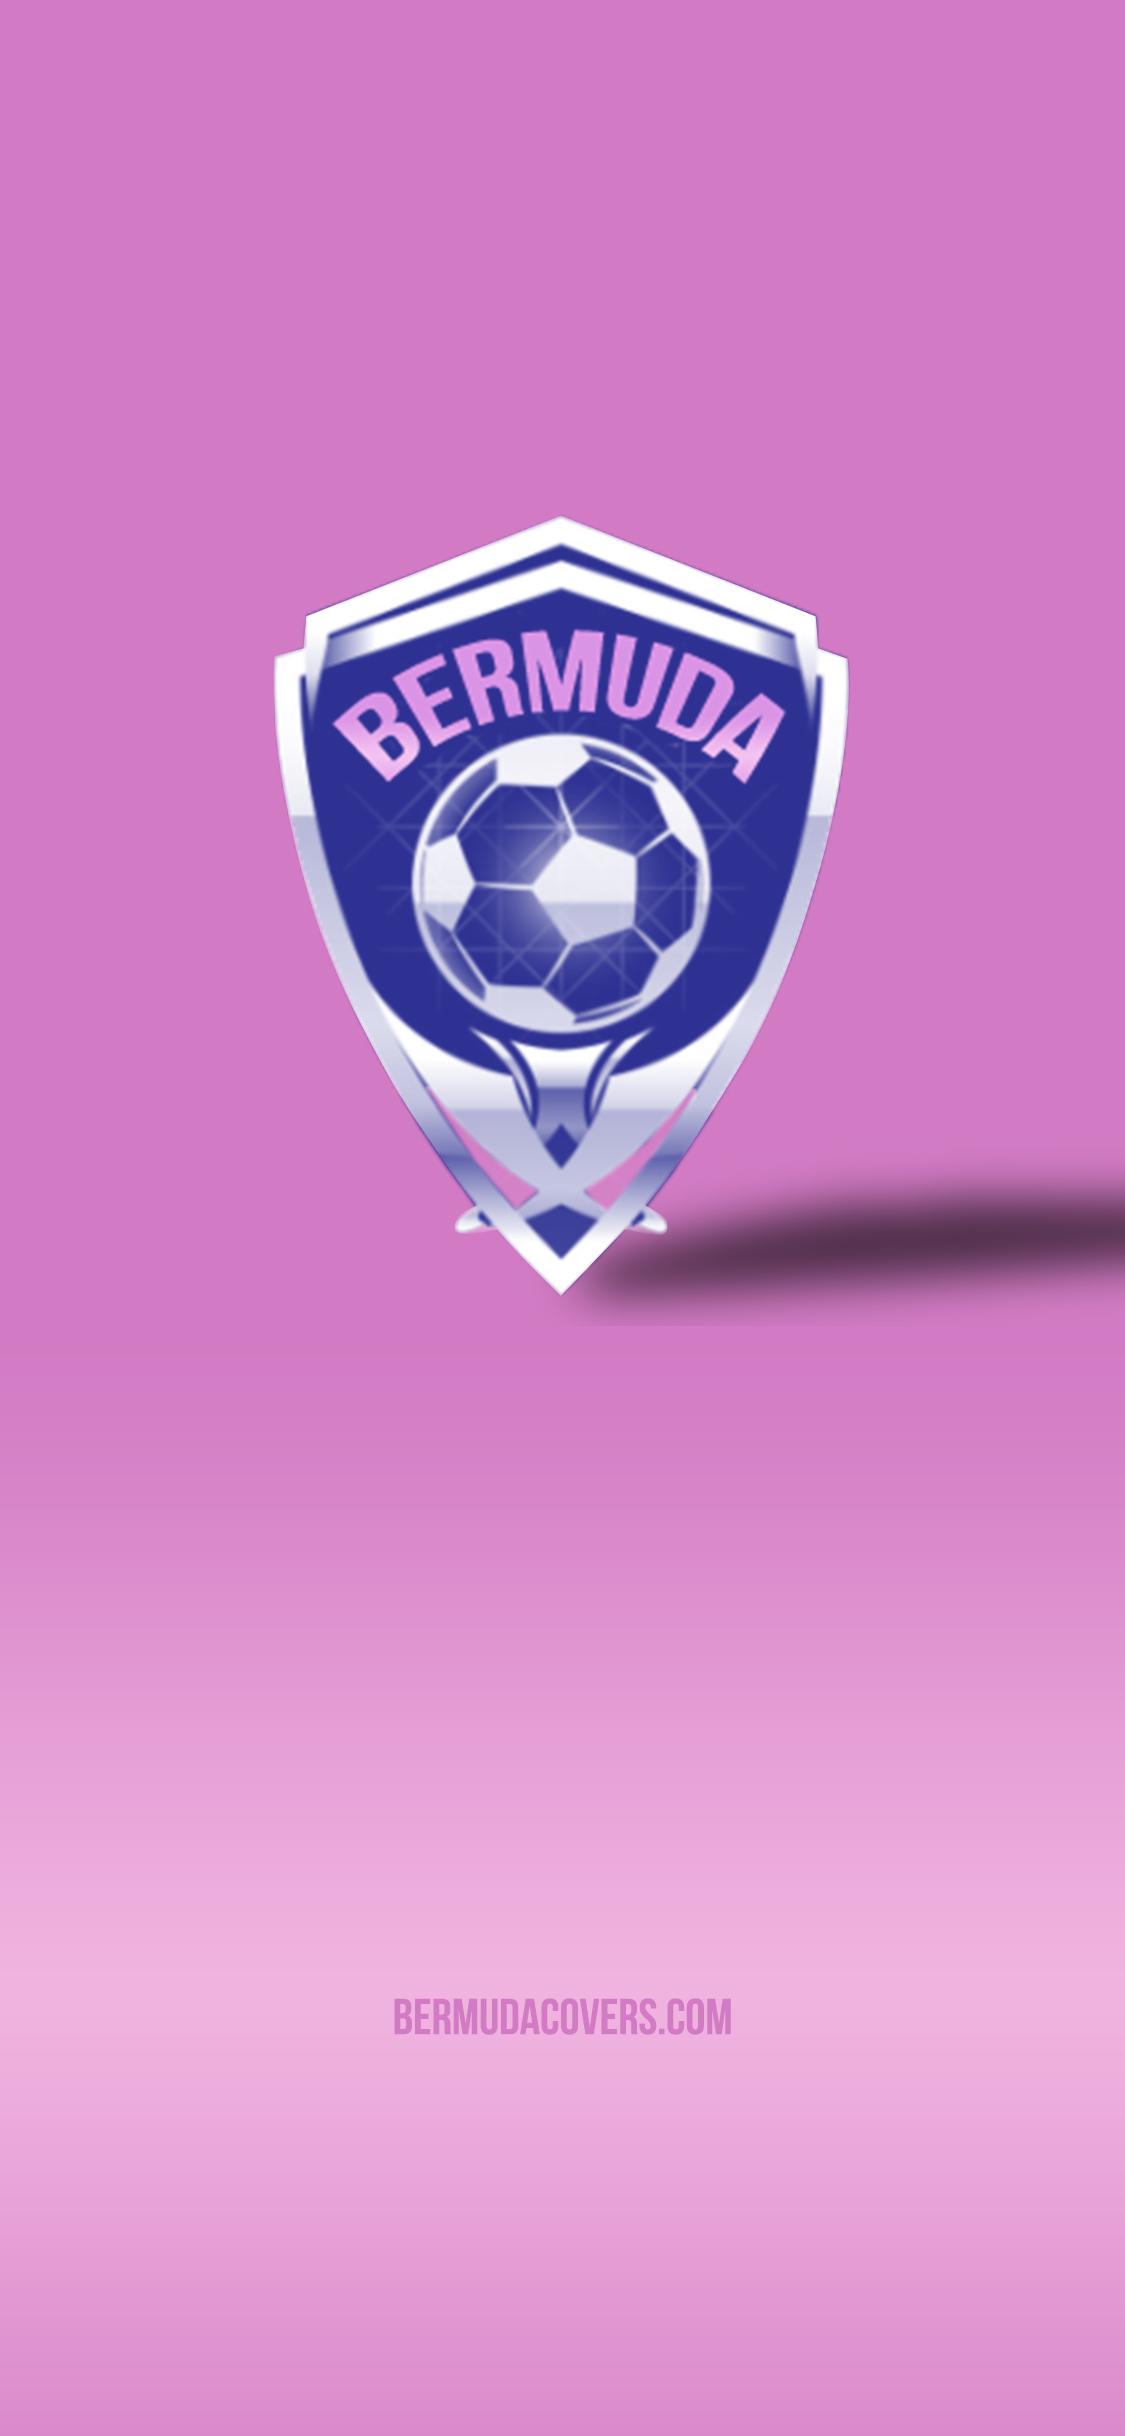 Bermuda-Football-Bernews-Mobile-phone-wallpaper-lock-screen-design-image-photo-E4jyLEUa-1